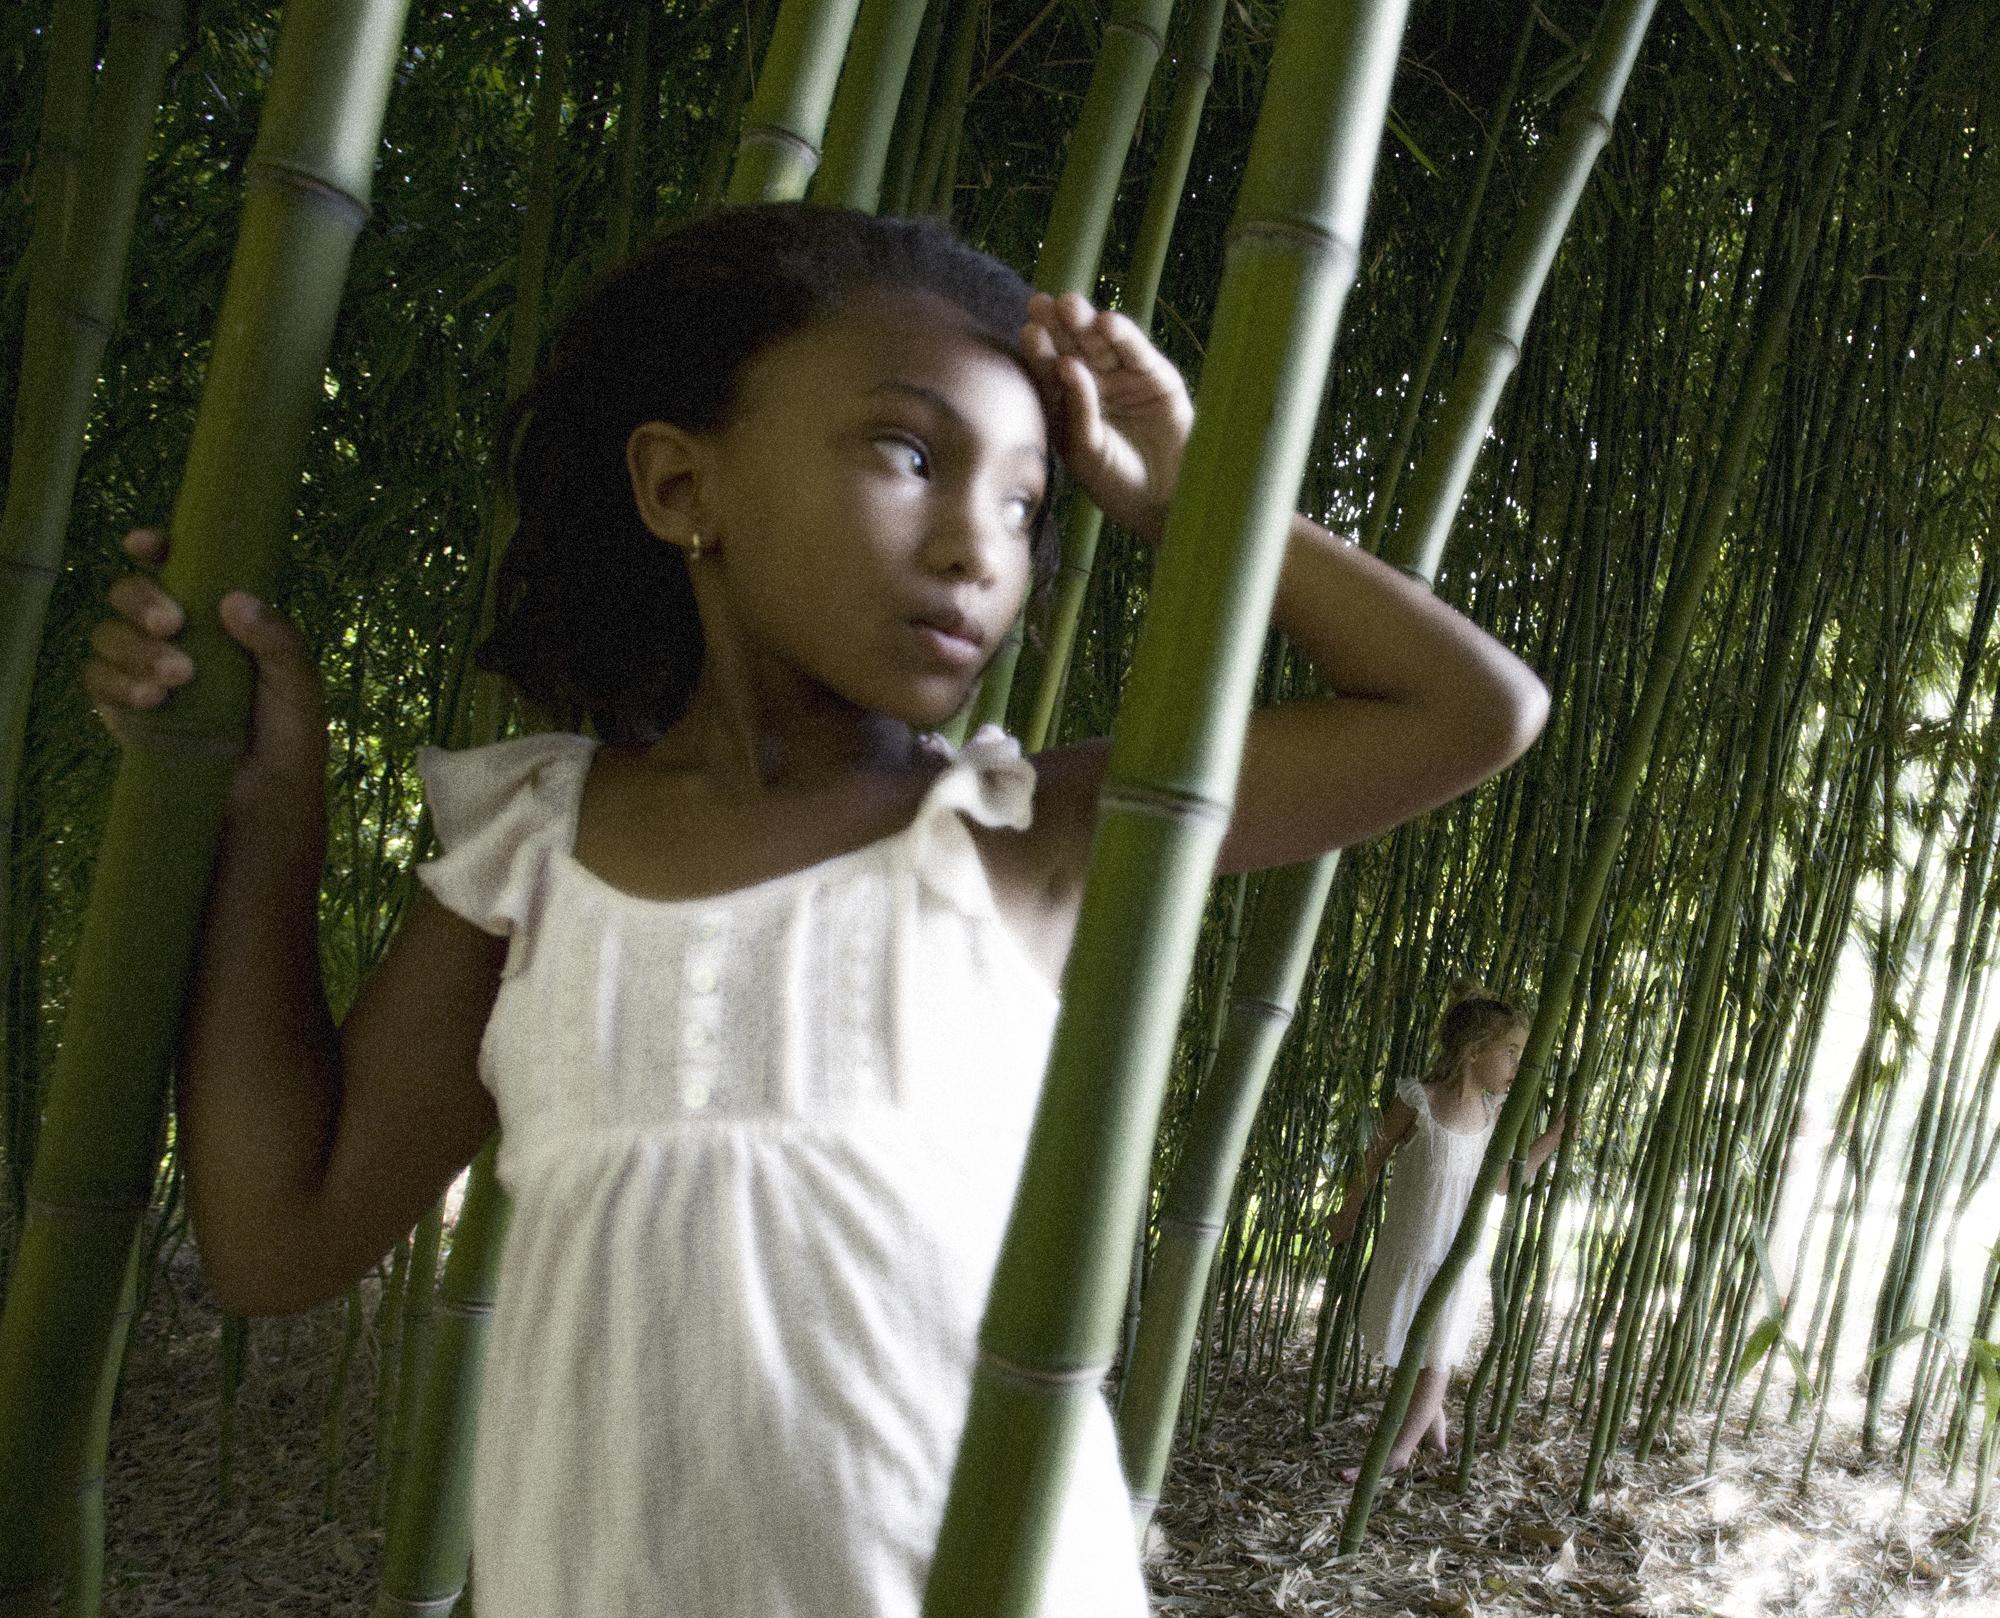 Rick Davis Photographic, Philadelphia, Still Life, Photography, Still Life Photography, Lifestyle, outdoor, bamboo, models